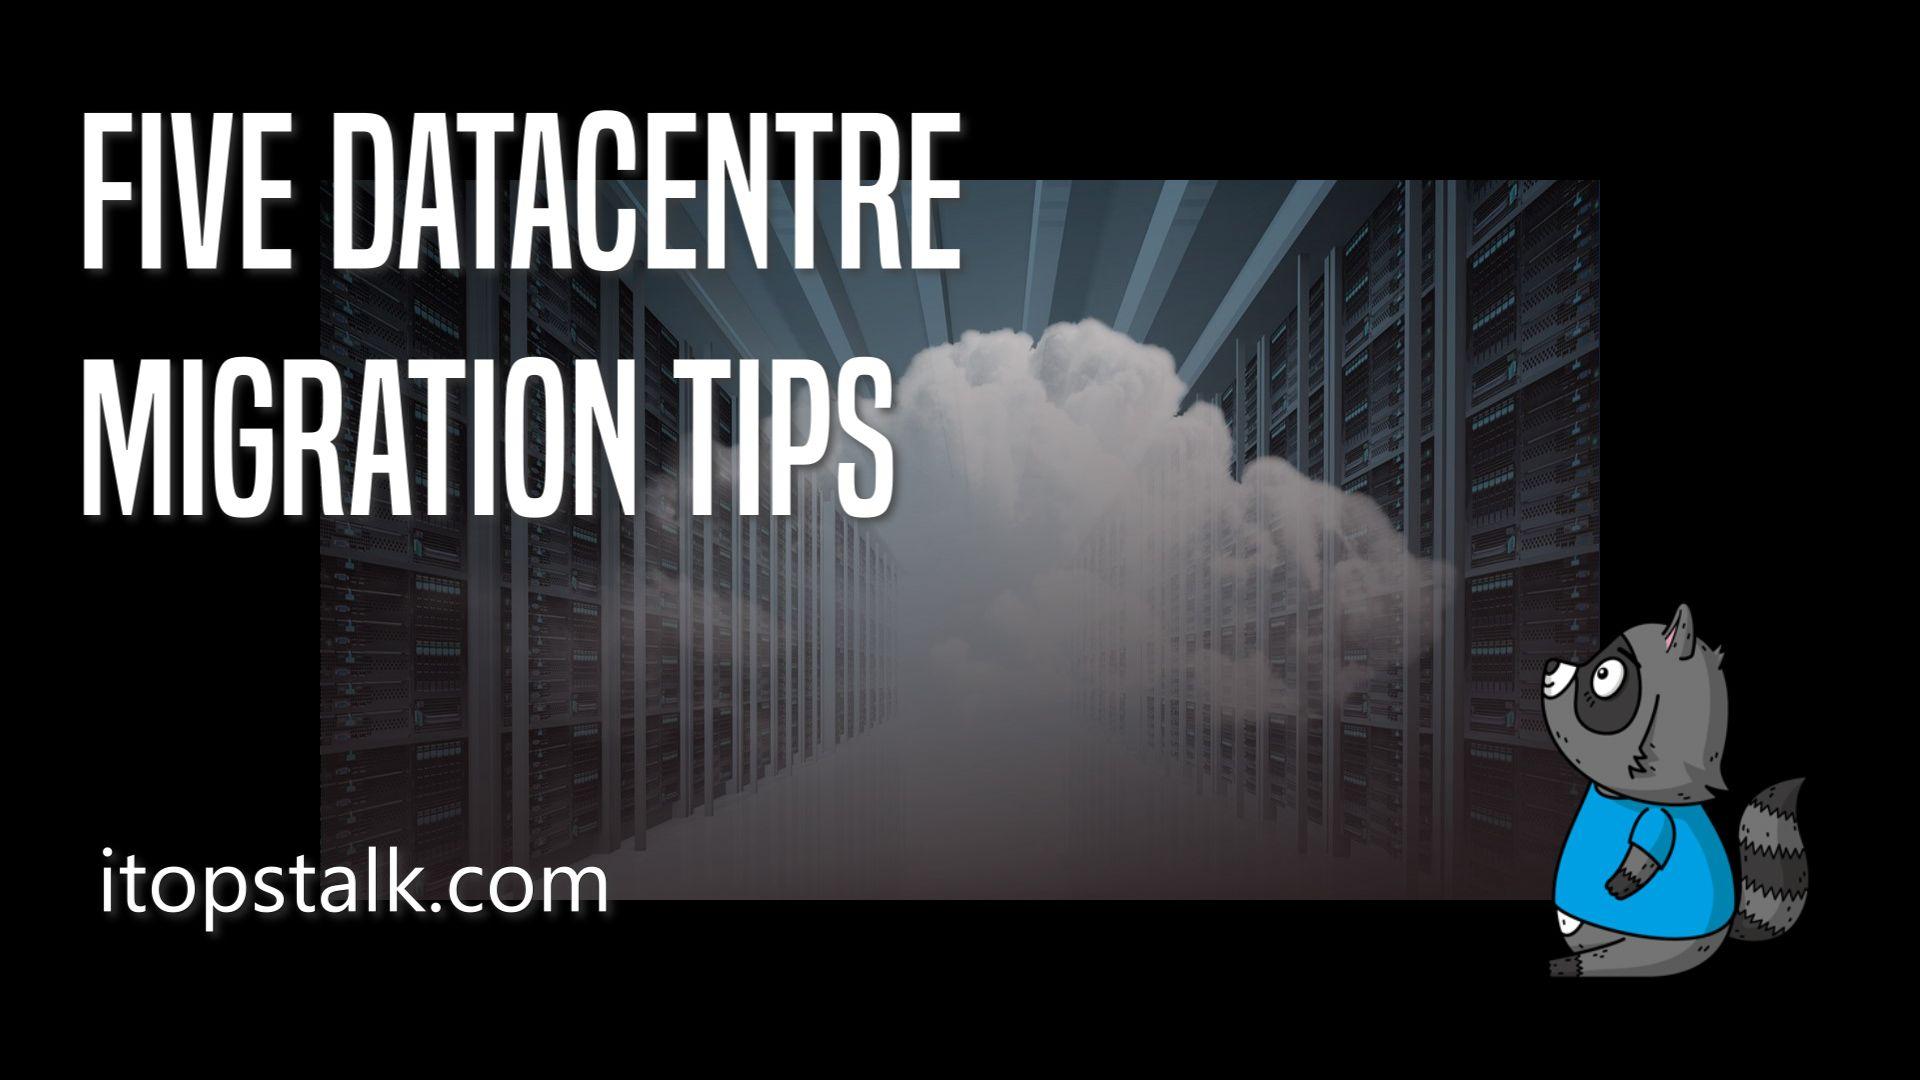 Five Datacentre Migration Tips